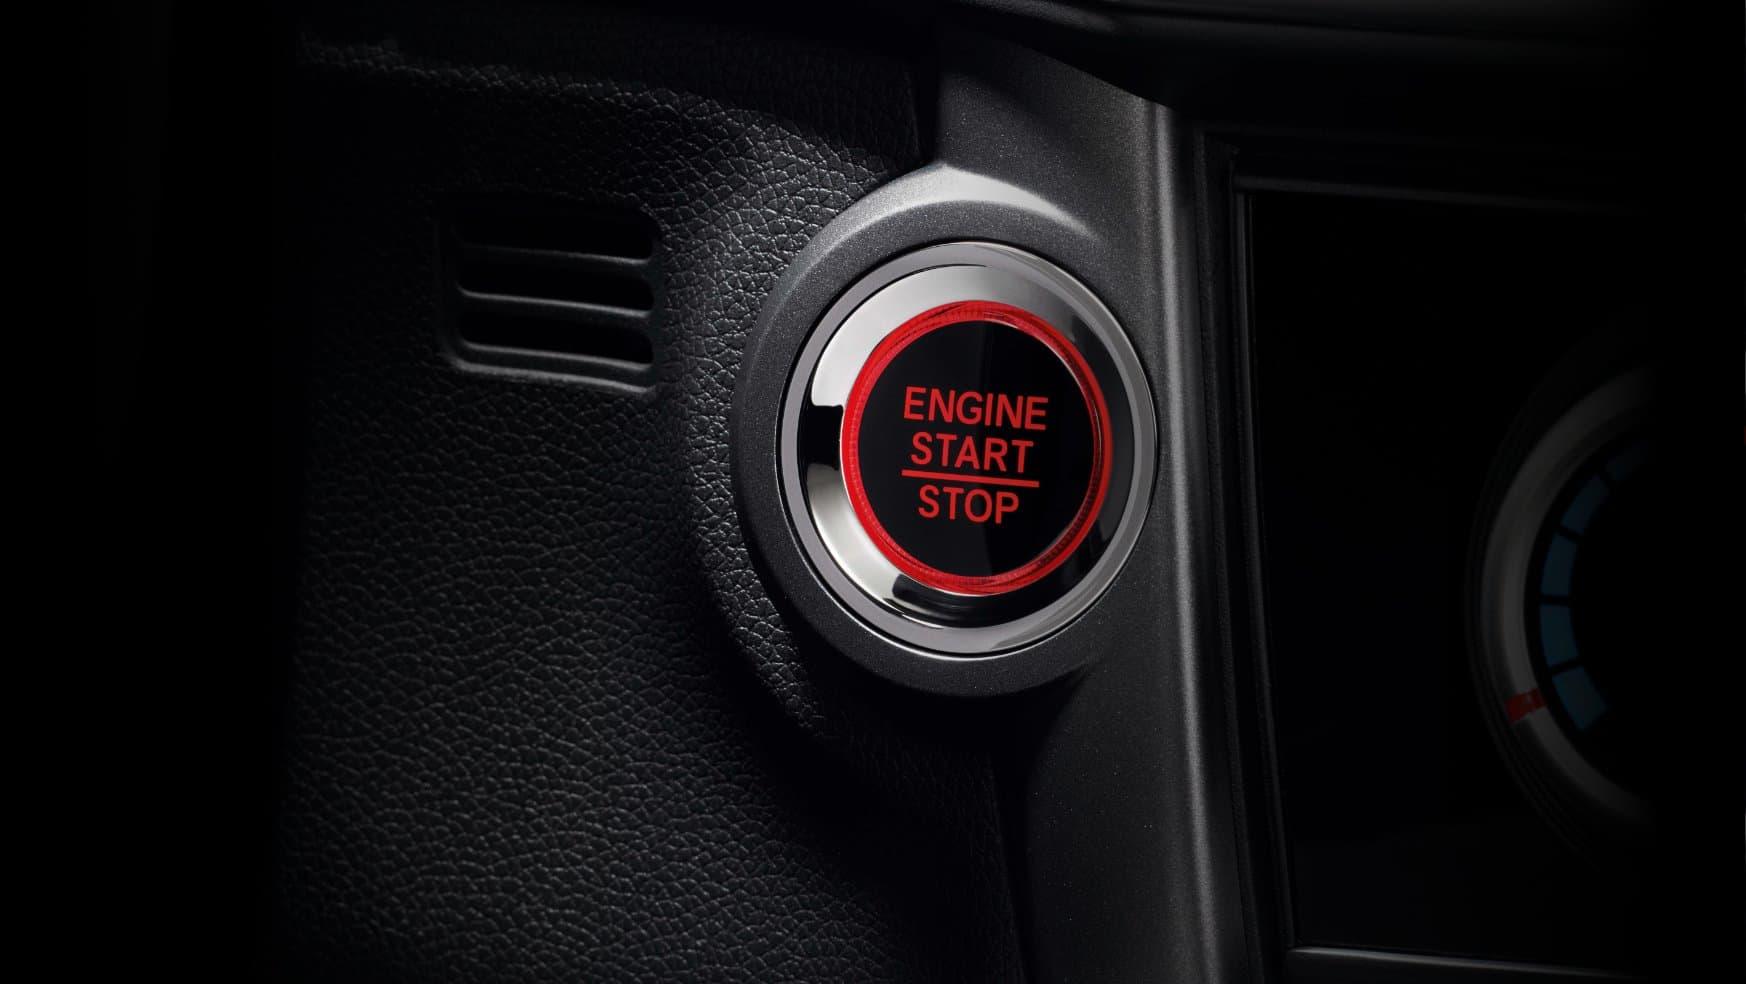 Push button start